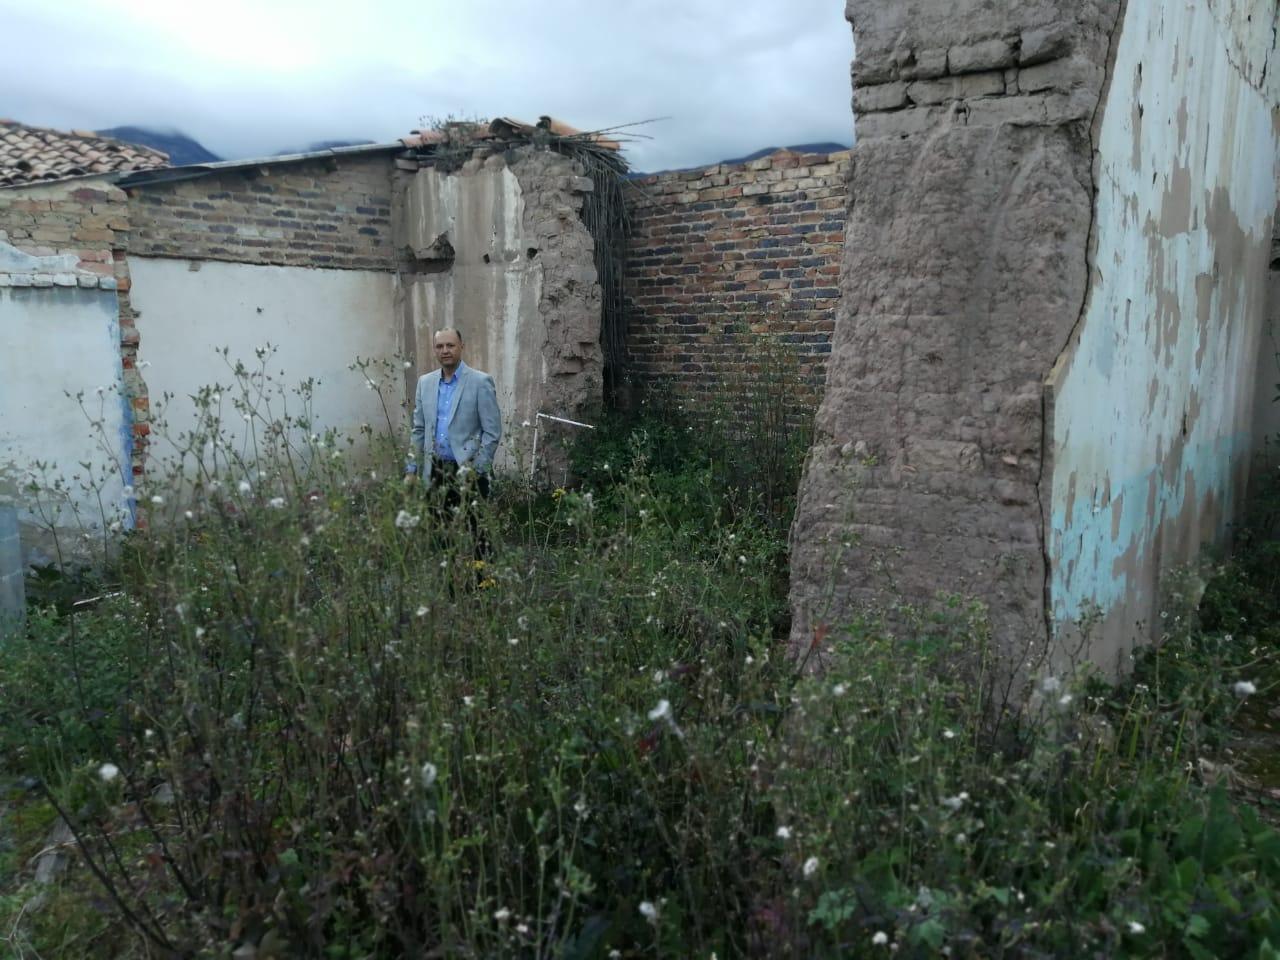 Rafael Betancur Zafra, en la casa destruída de Casilda Zafra